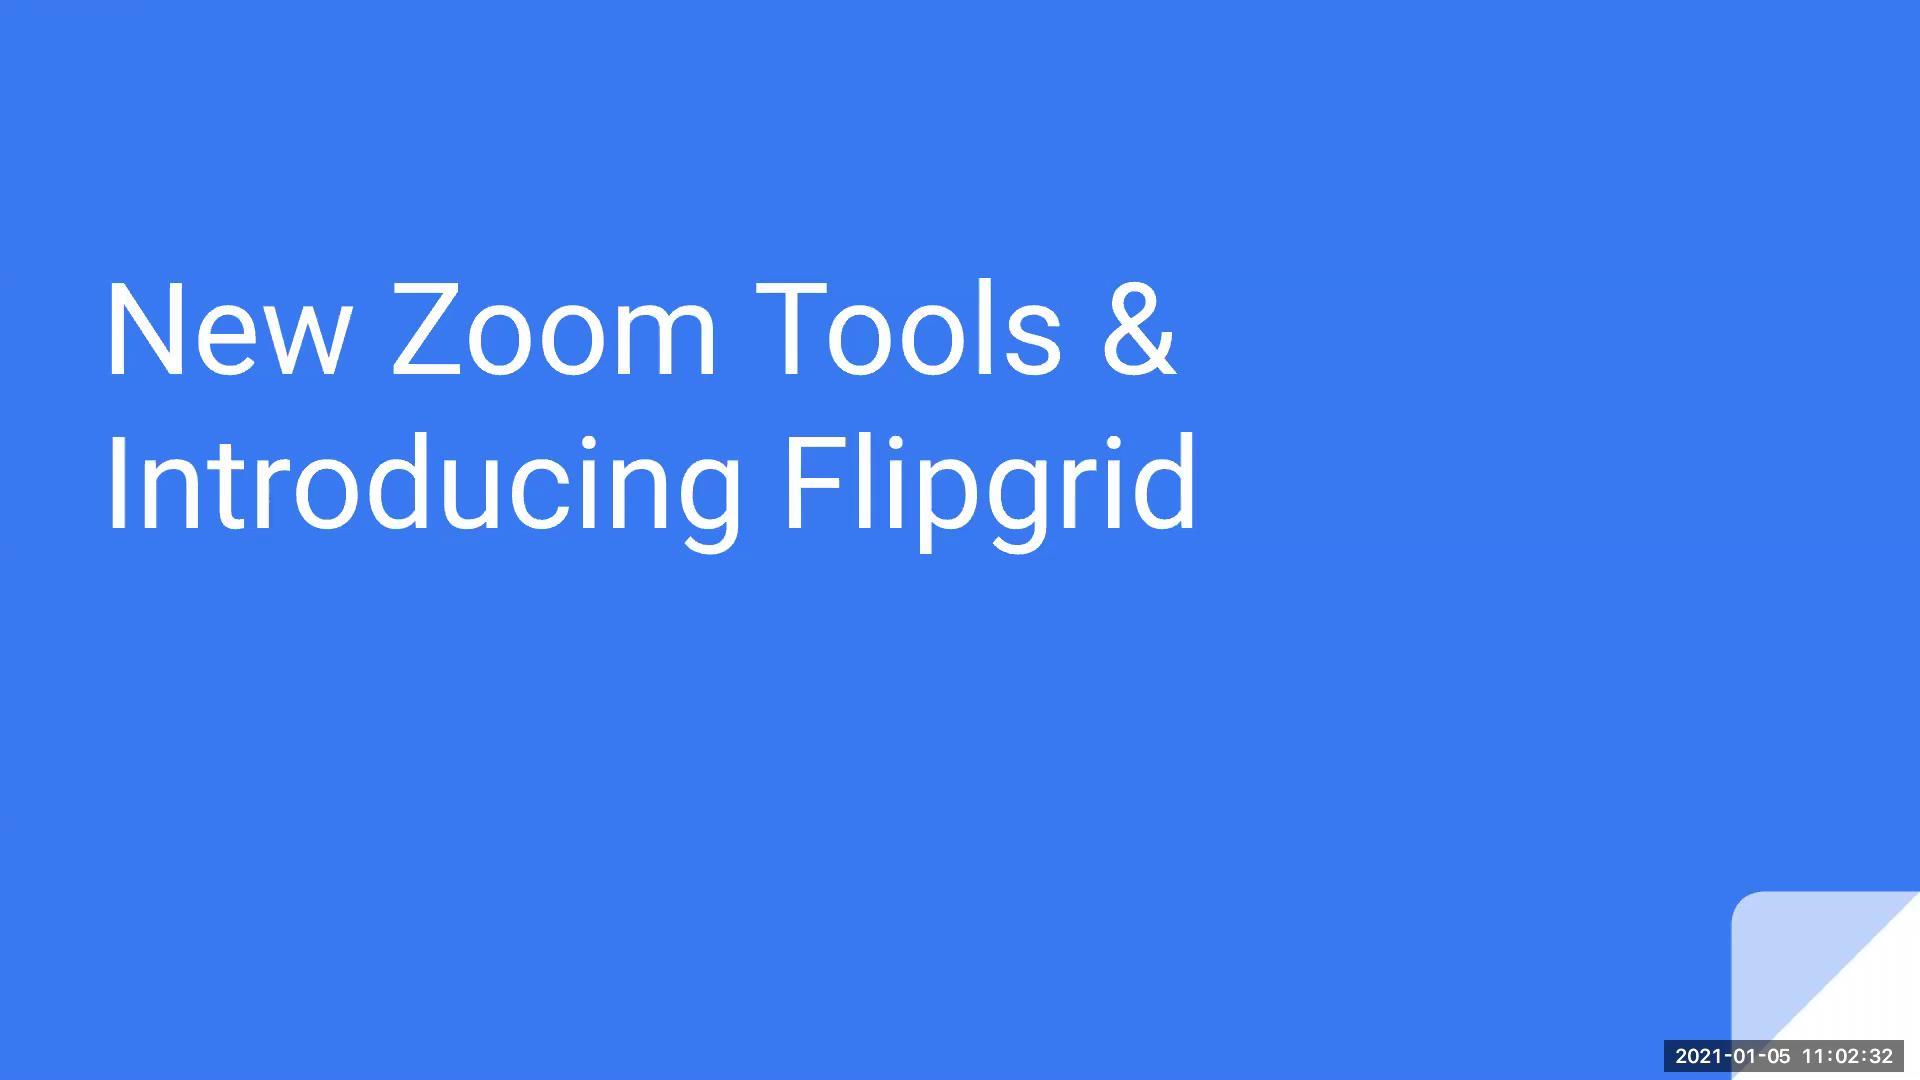 New Zoom Updates & Flipgrid : 01/05/2021 Edited